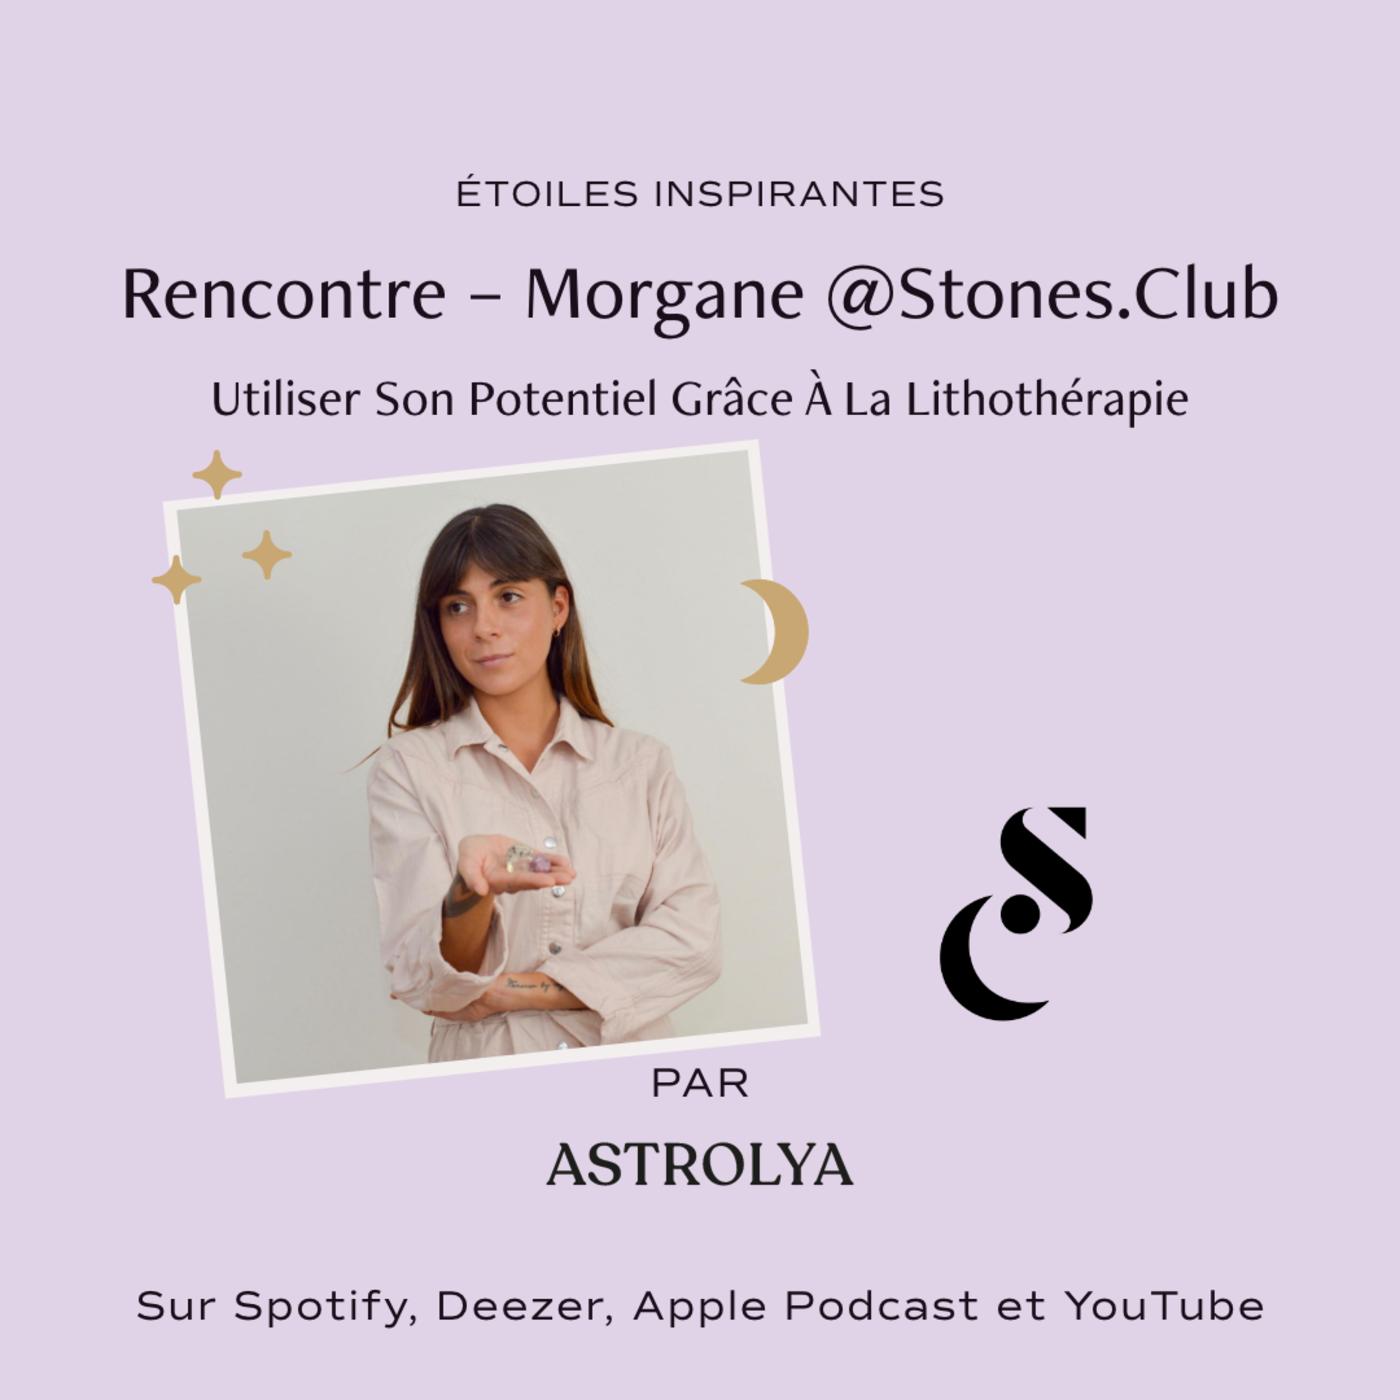 Rencontre avec Morgane @Stones.Club